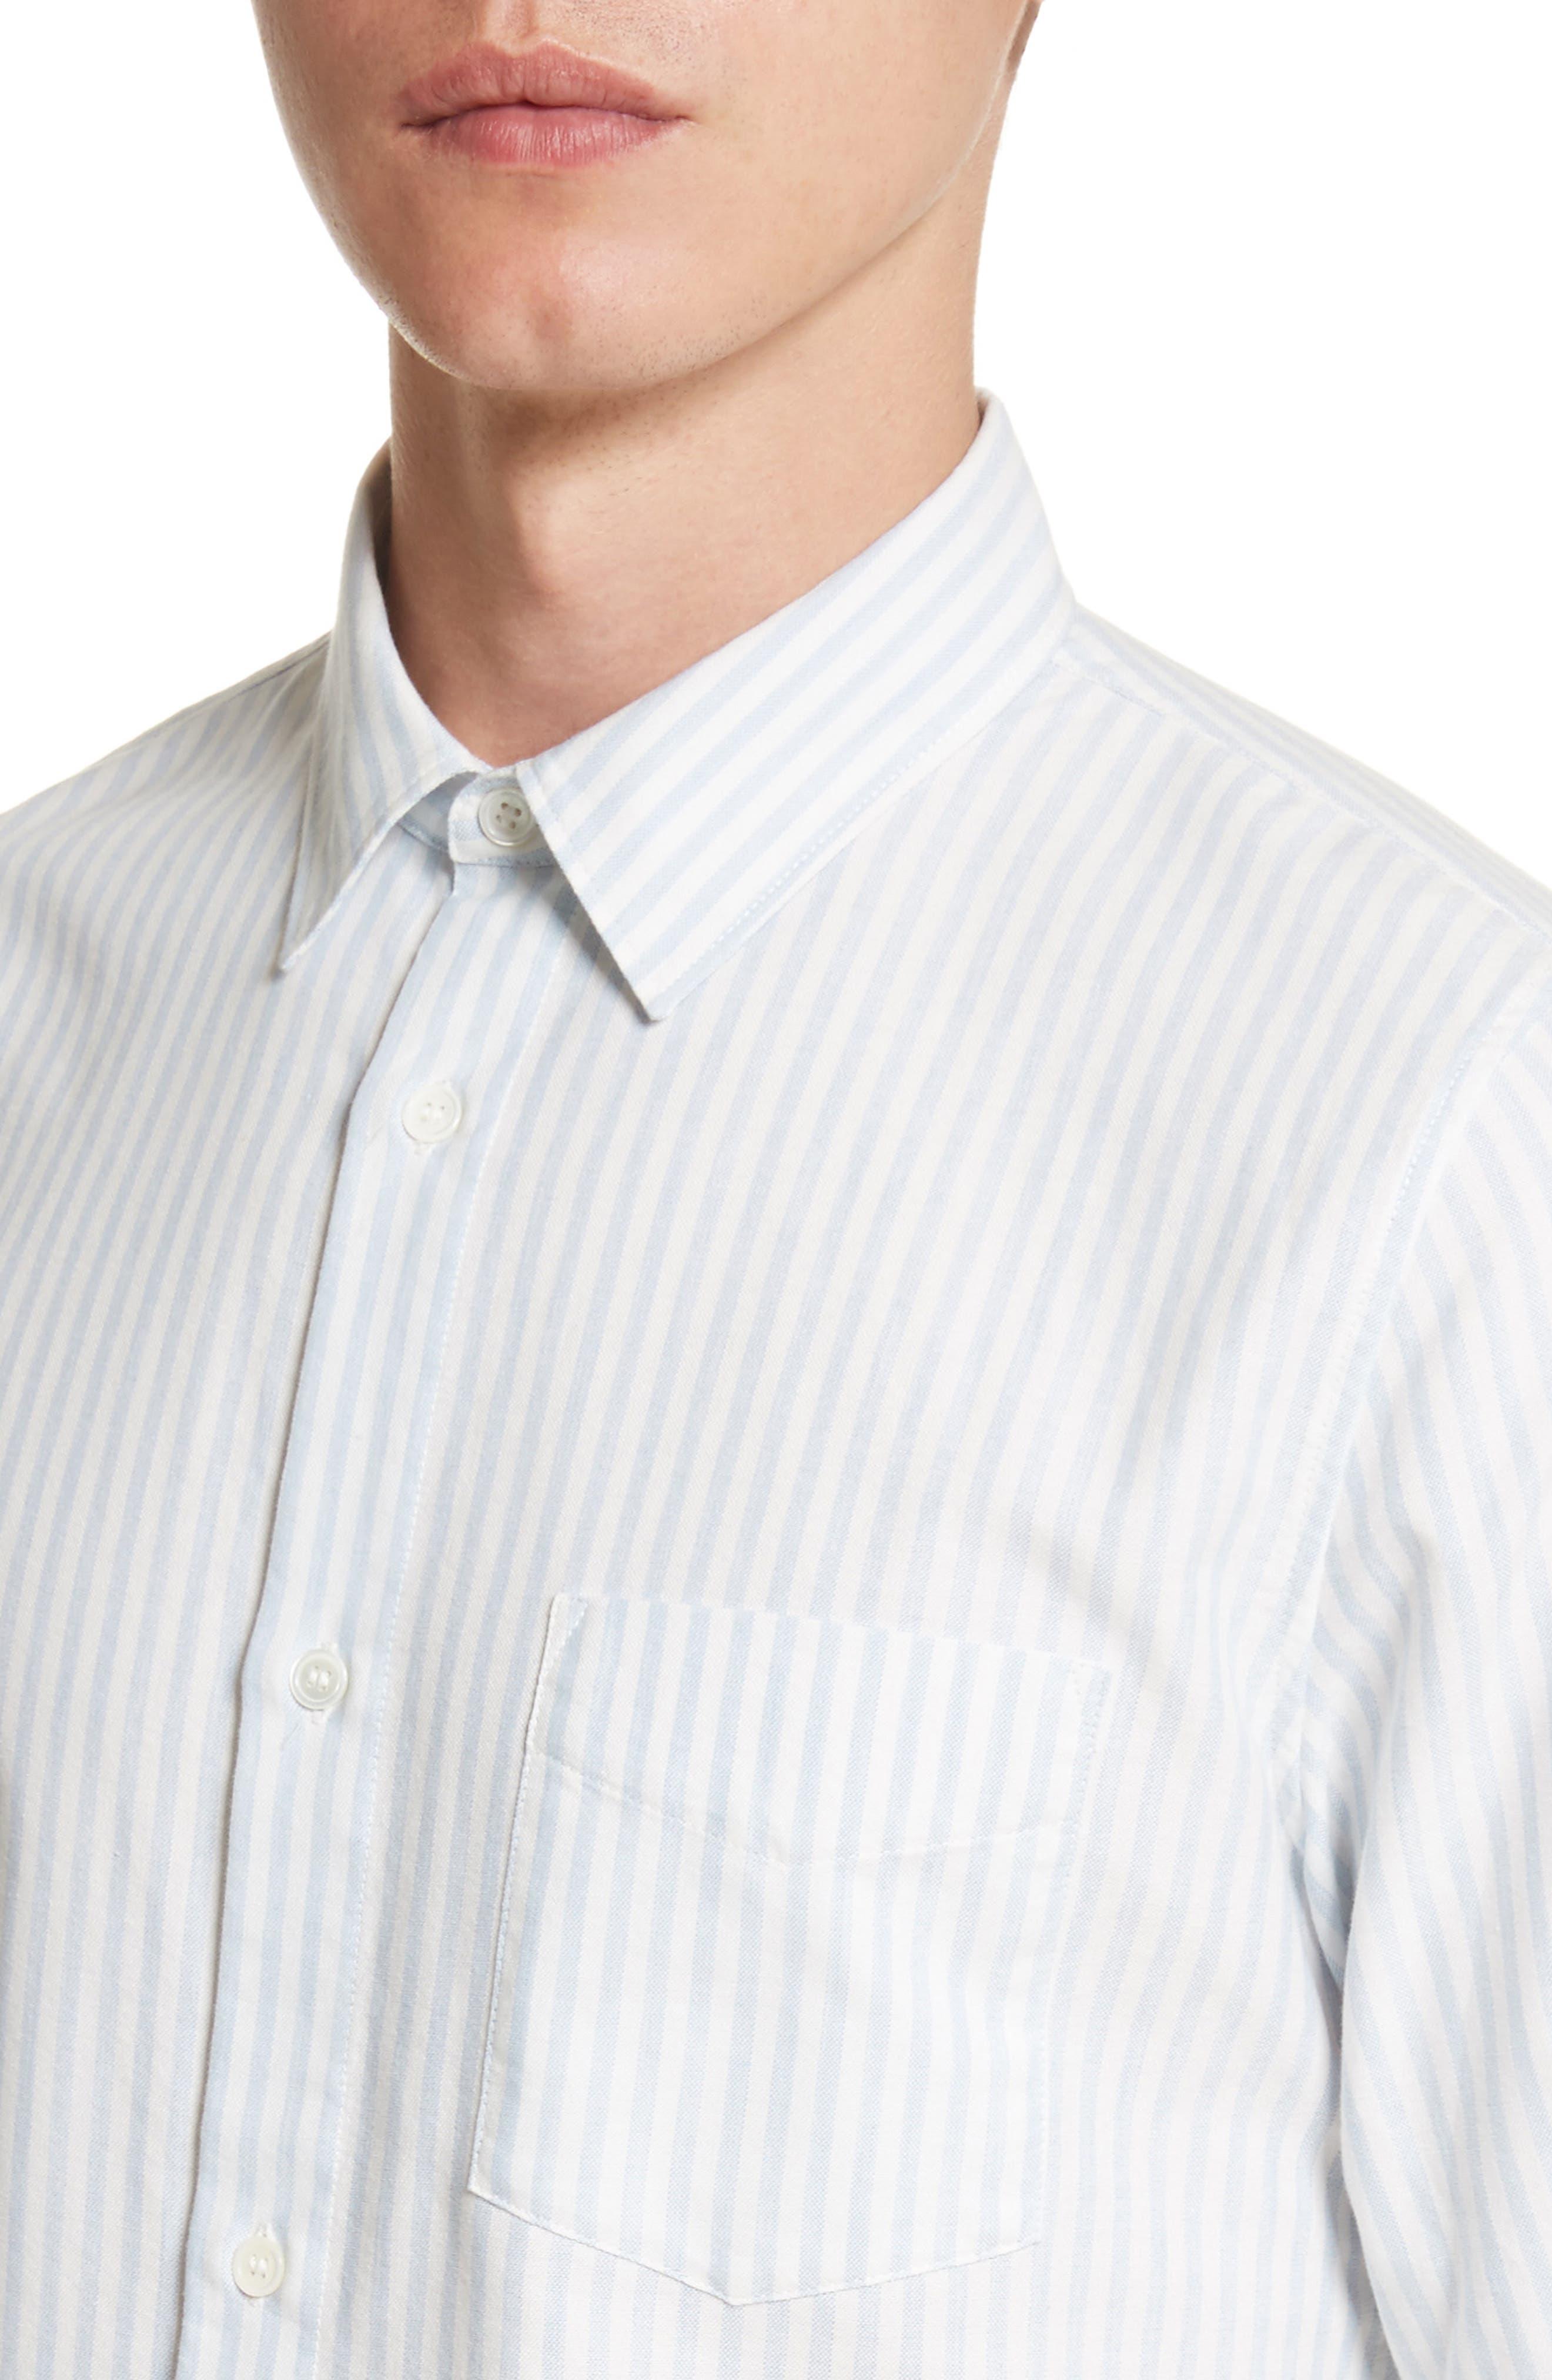 Oliver Stripe Oxford Shirt,                             Alternate thumbnail 4, color,                             430